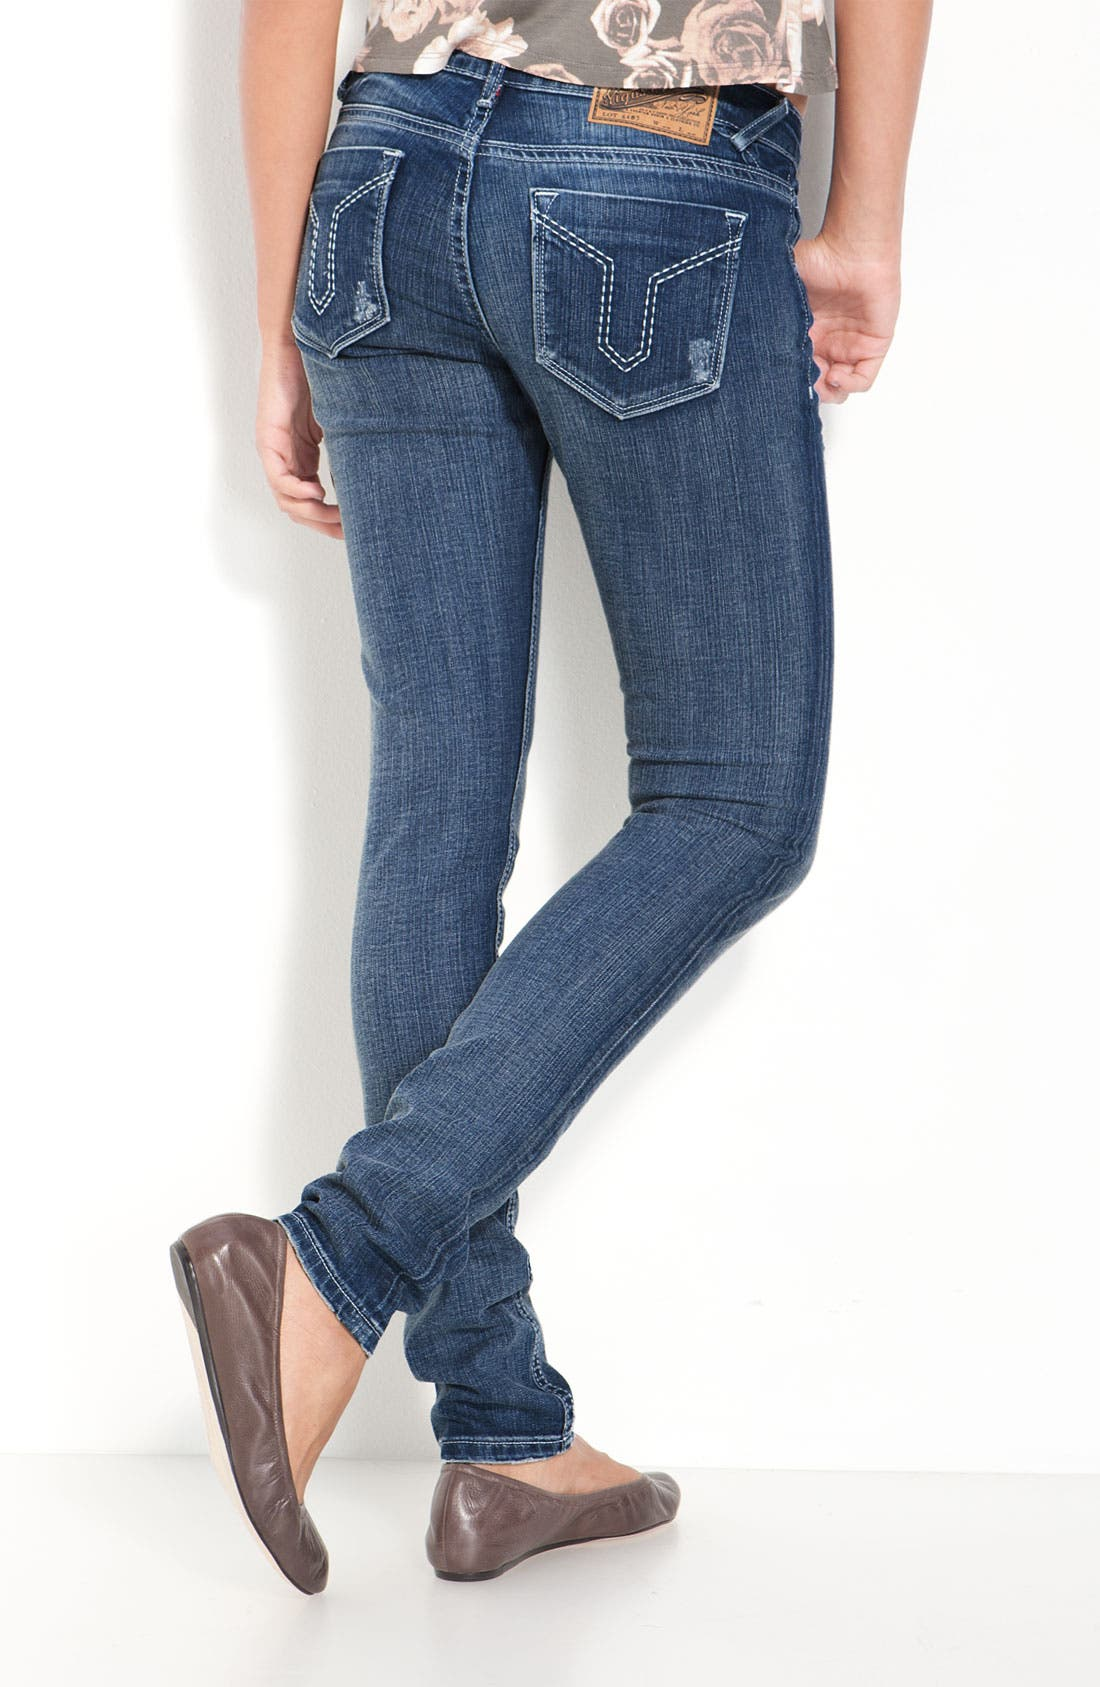 Alternate Image 1 Selected - Vigoss 'Double V' Skinny Stretch Jeans (Juniors)